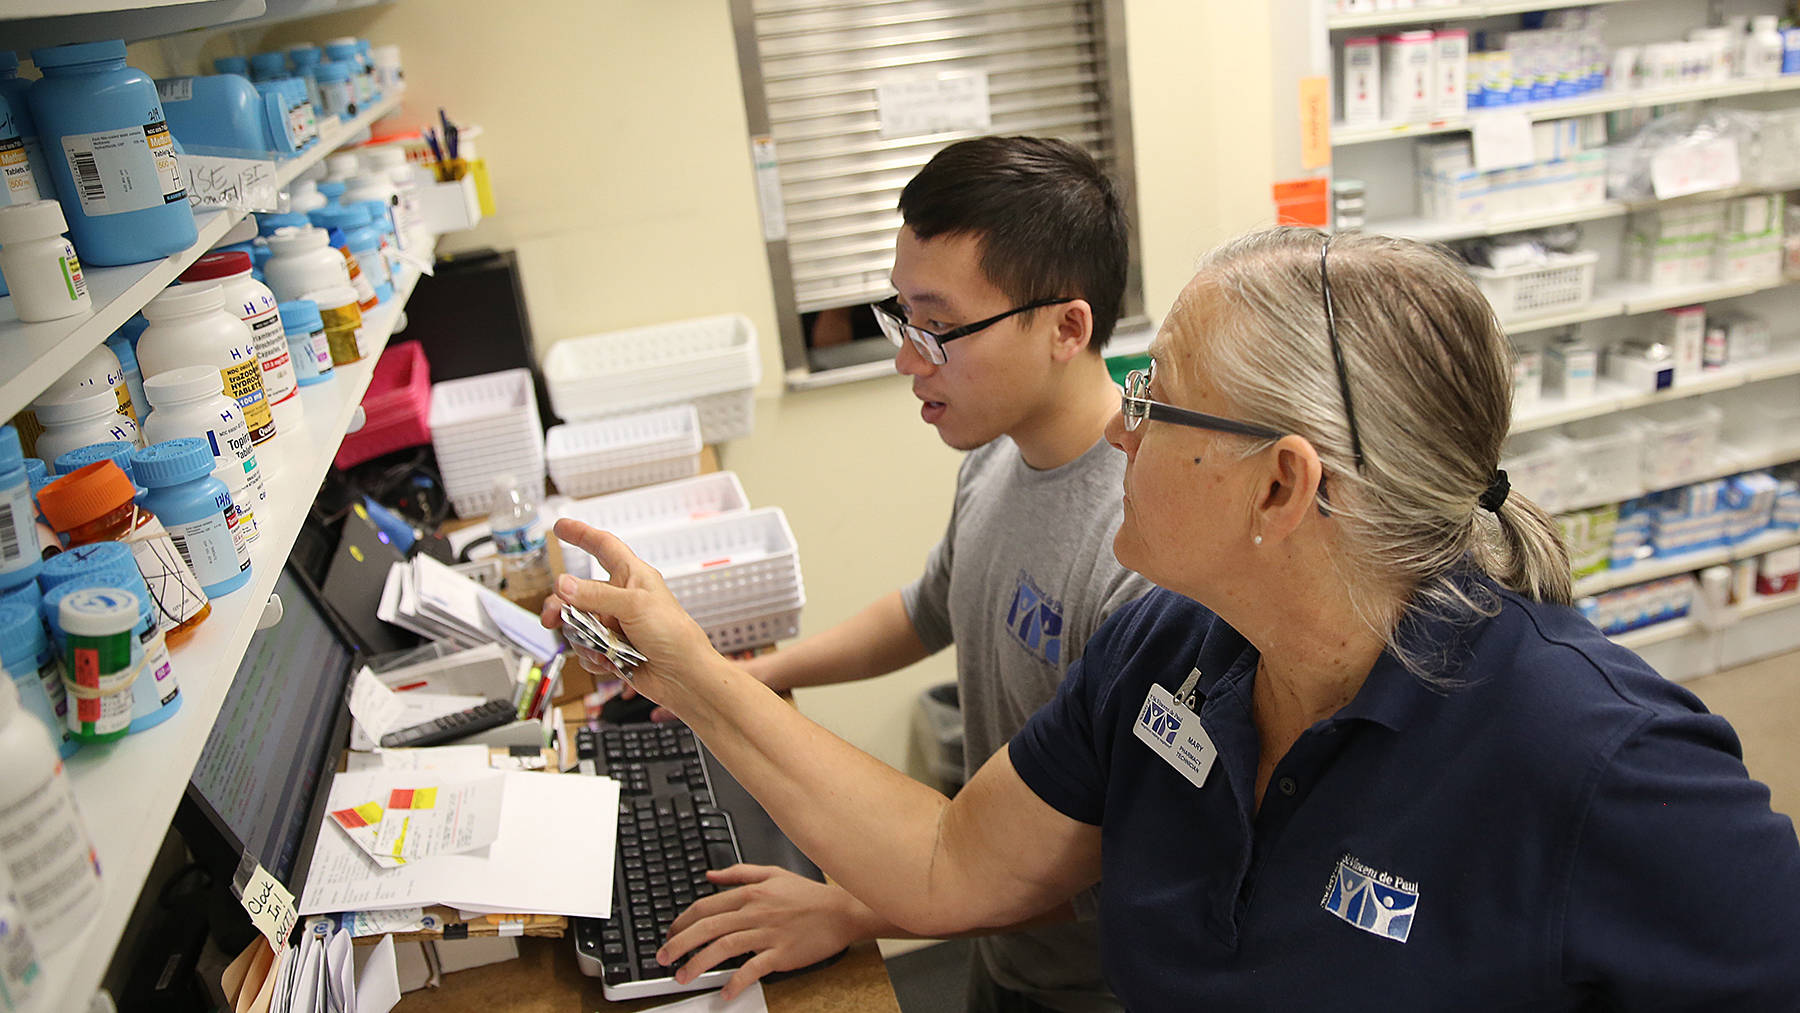 Pharmacists fill prescriptions at St. Vincent de Paul Charitable Pharmacy in Cincinnati, Ohio. (File photo courtesy of SVDP)